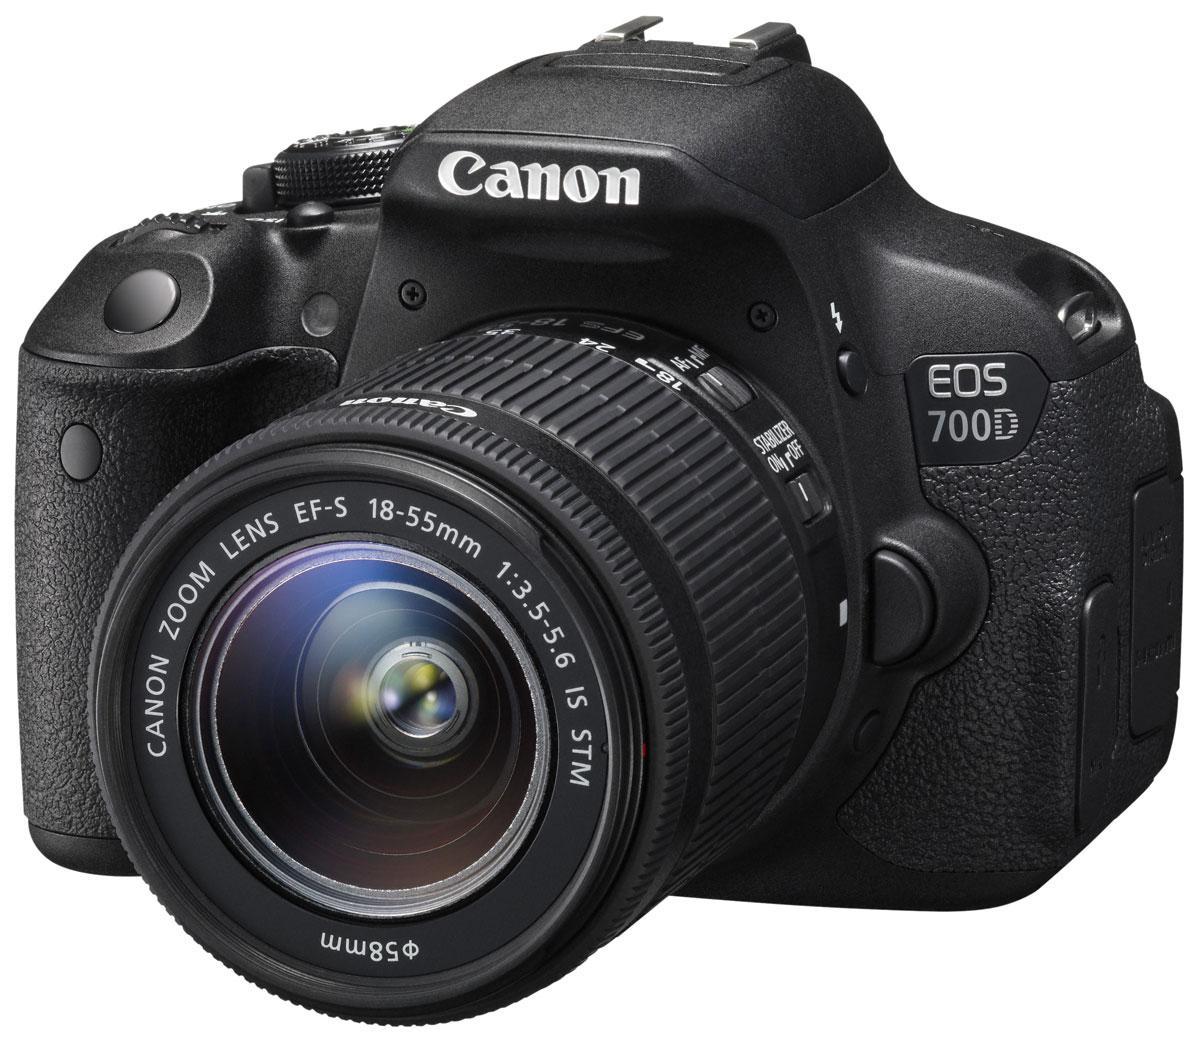 Canon EOS 700D Kit EF-S 18-55 IS STM цифровая зеркальная фотокамера - Зеркальные фотоаппараты